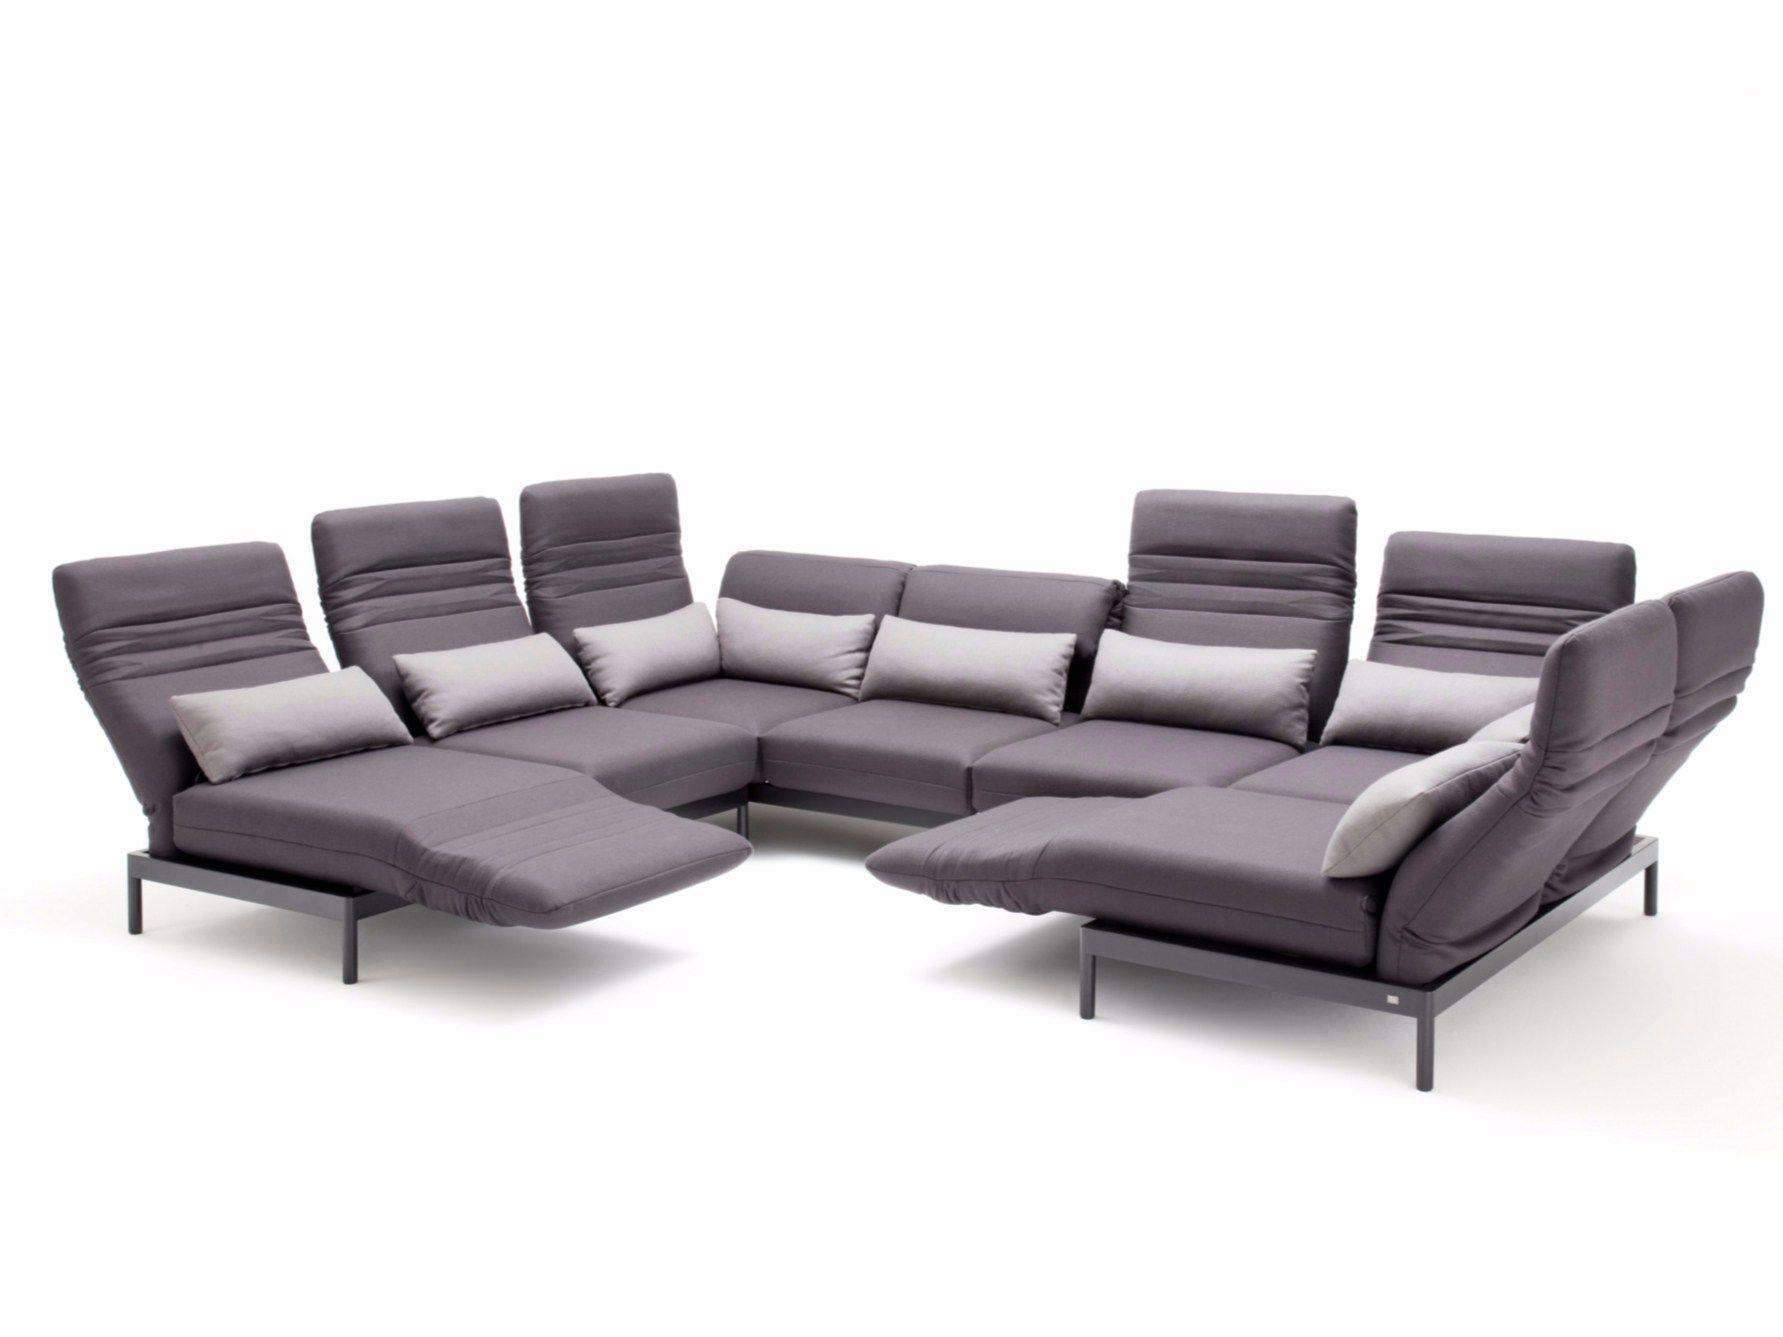 plura corner sofa plura collection by rolf benz design. Black Bedroom Furniture Sets. Home Design Ideas